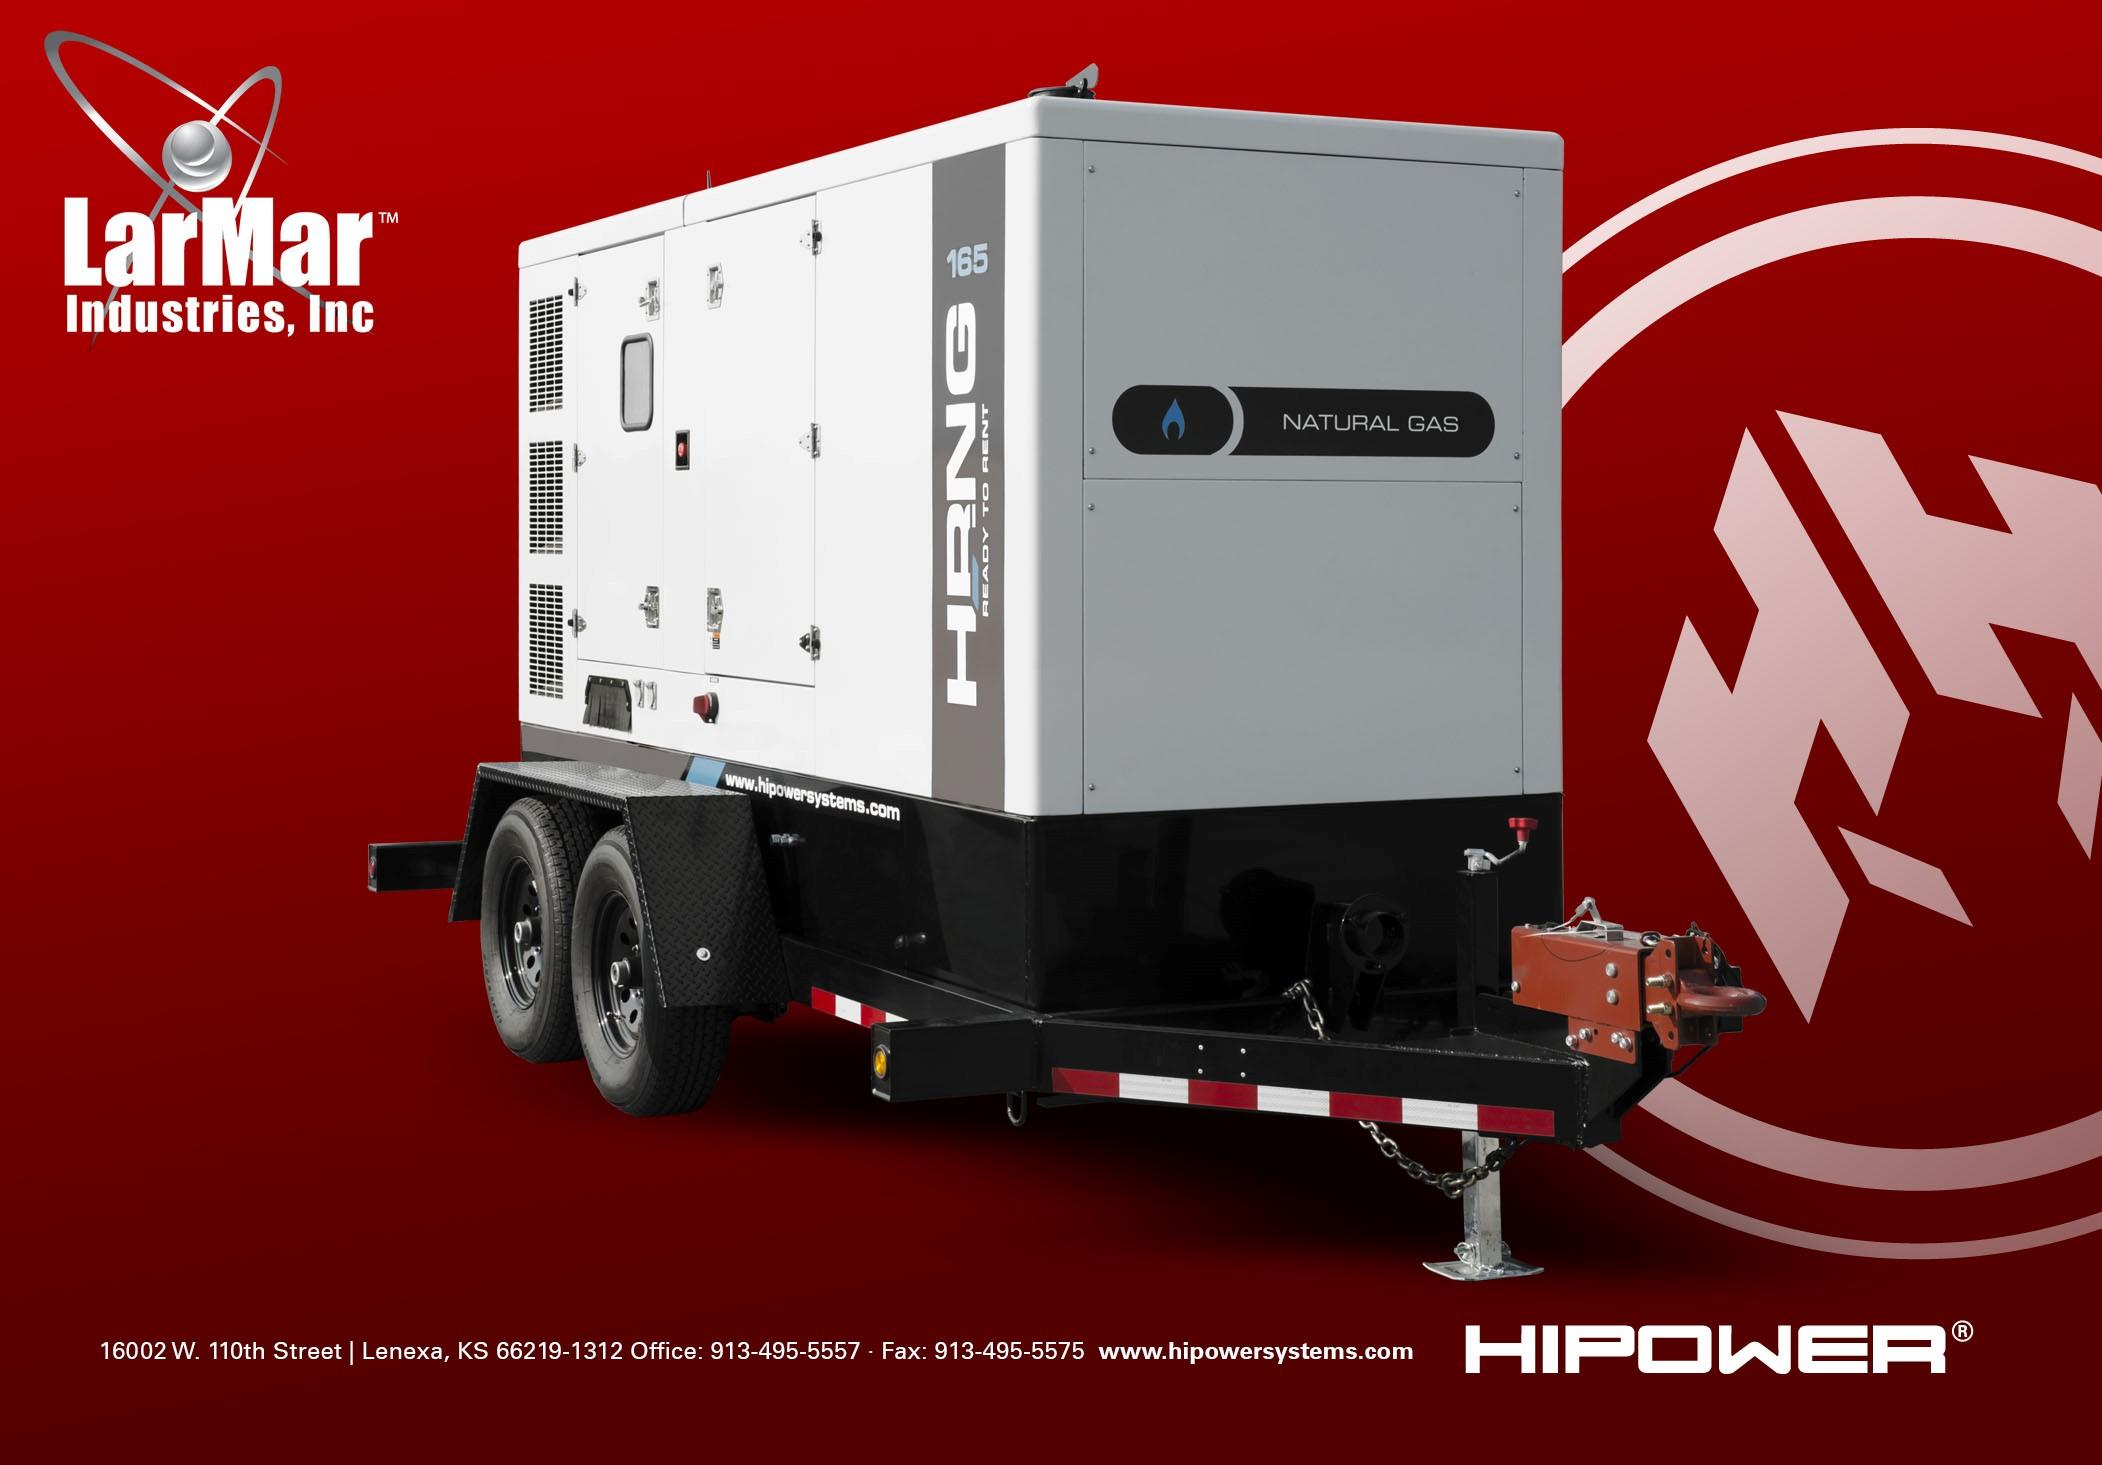 HIPOWER Distributors LarMar Industries